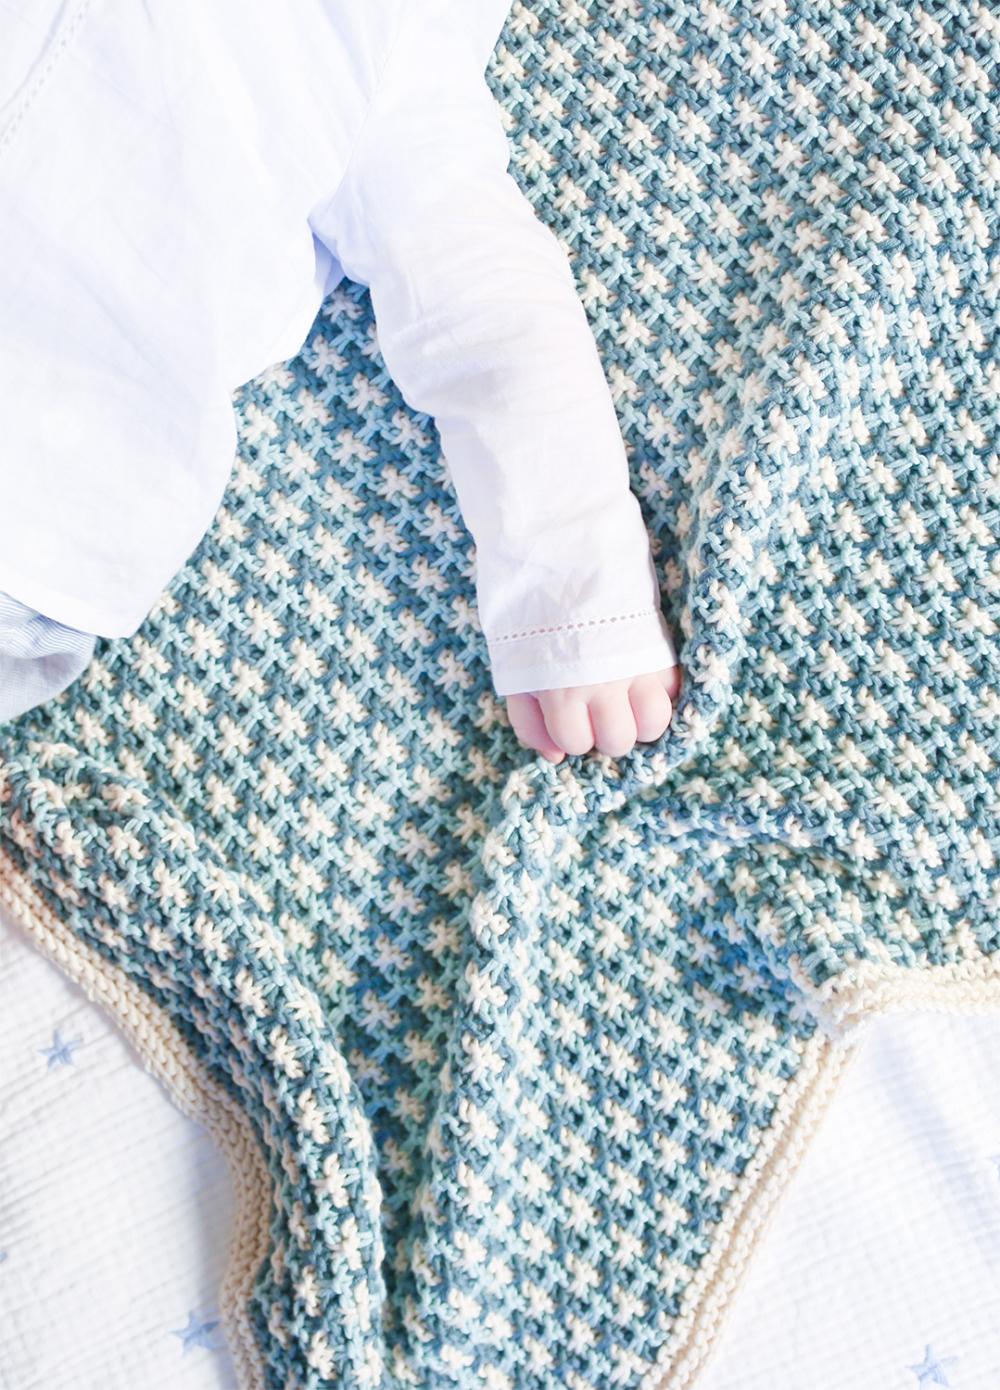 Knitting Kit Pima Cotton Frisbee Blanket 1 In 2020 Knitting Kits Baby Knitting Knitted Blankets